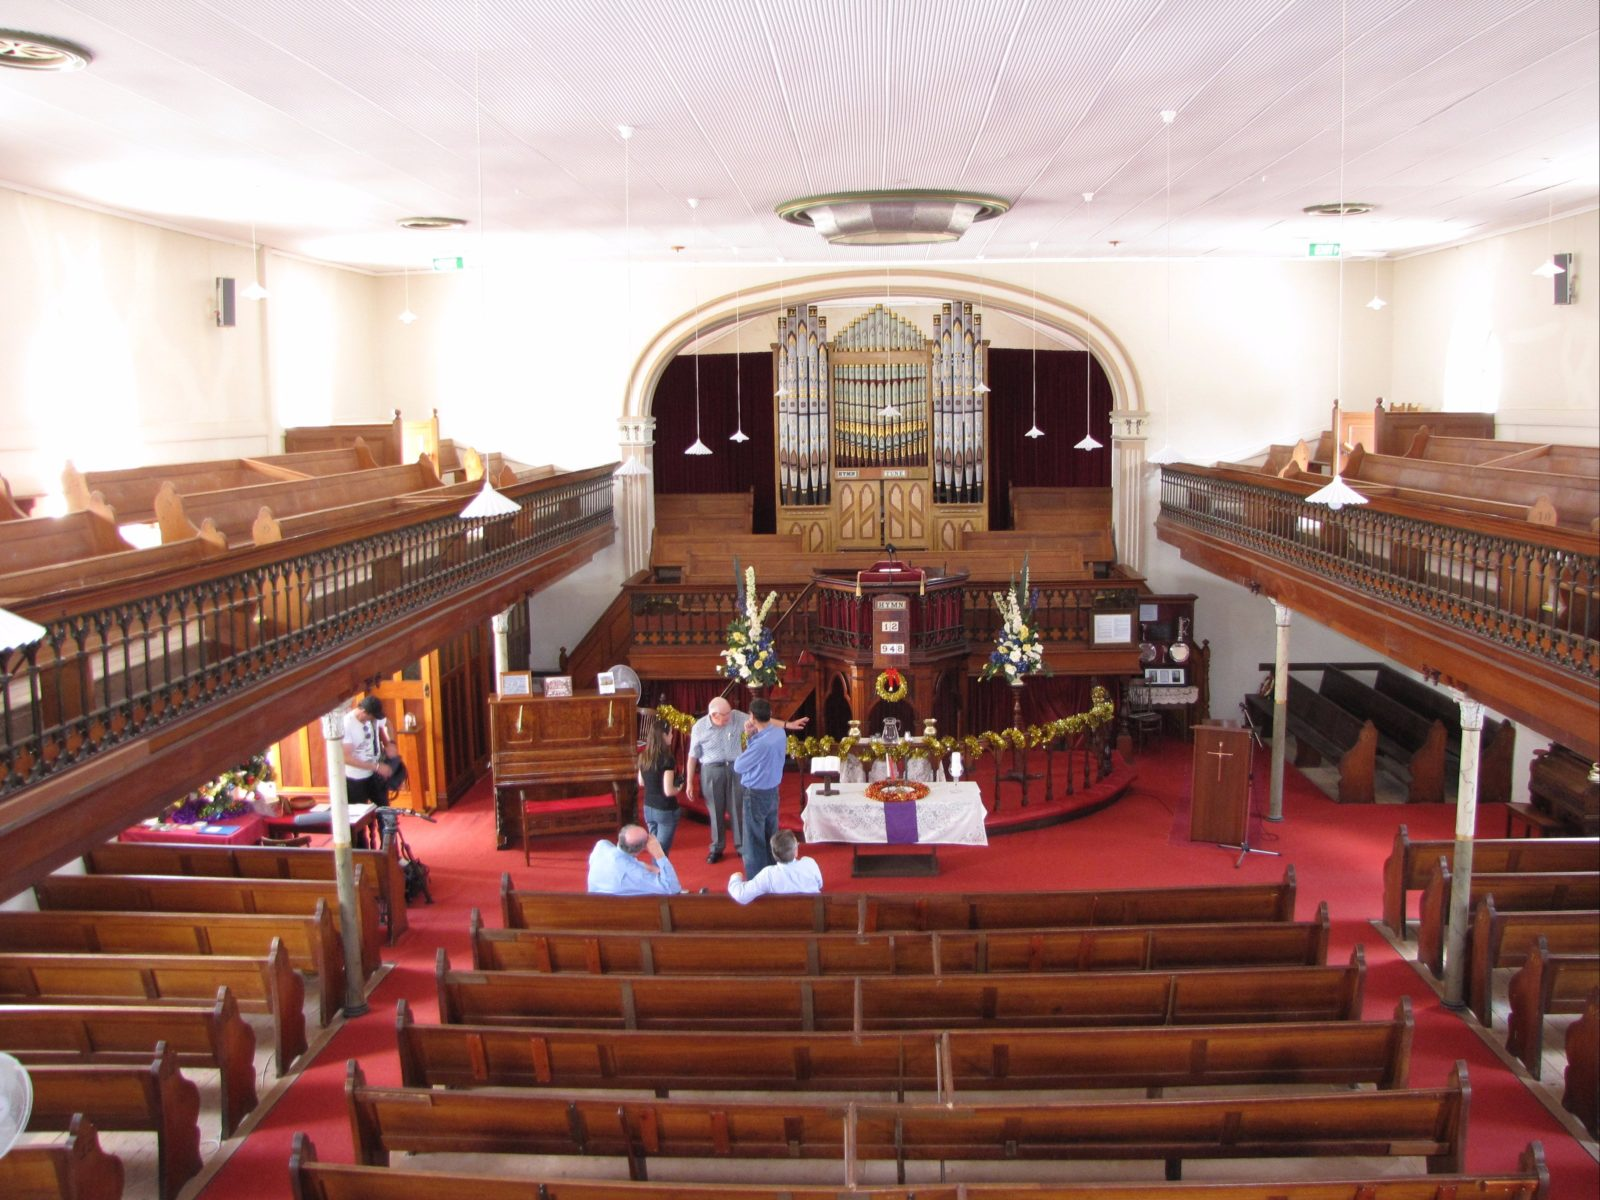 Moonta Mines Uniting Church